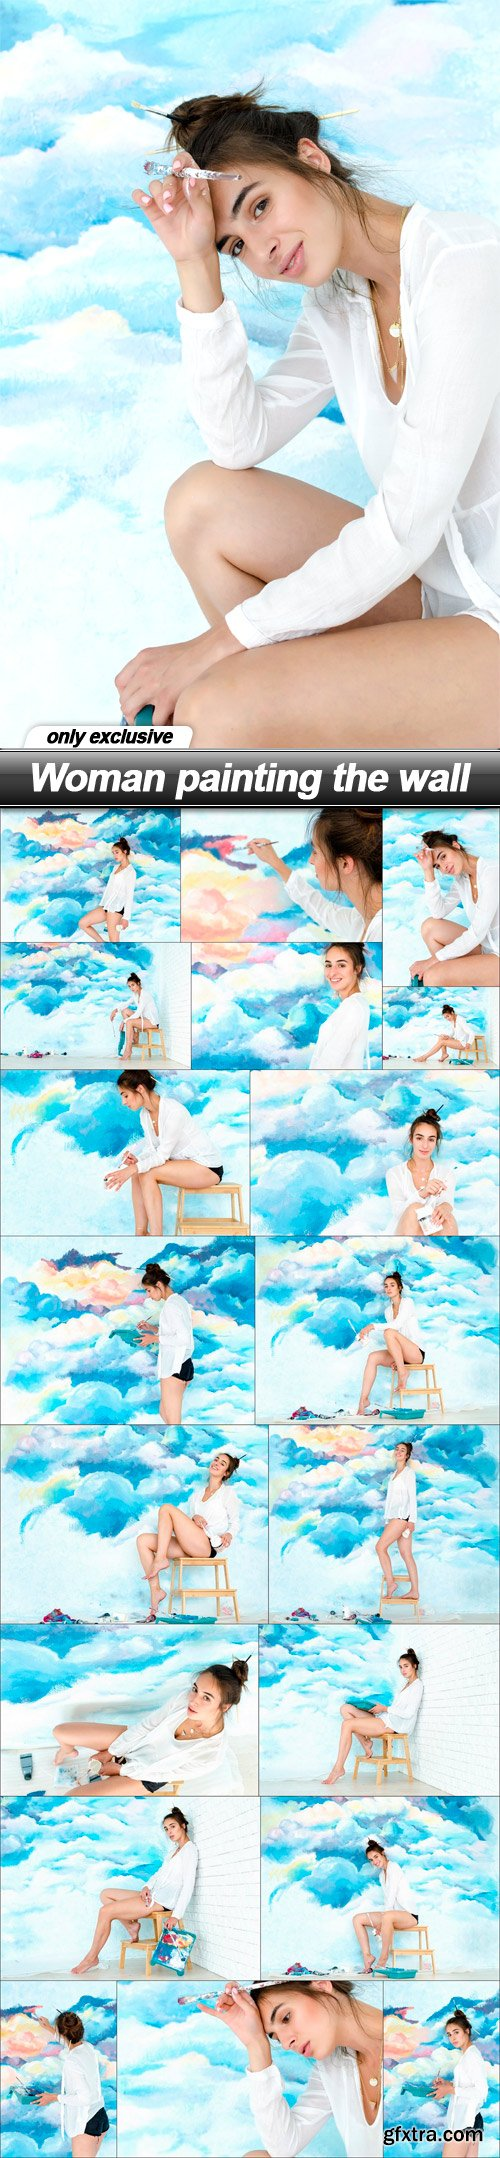 Woman painting the wall - 19 UHQ JPEG